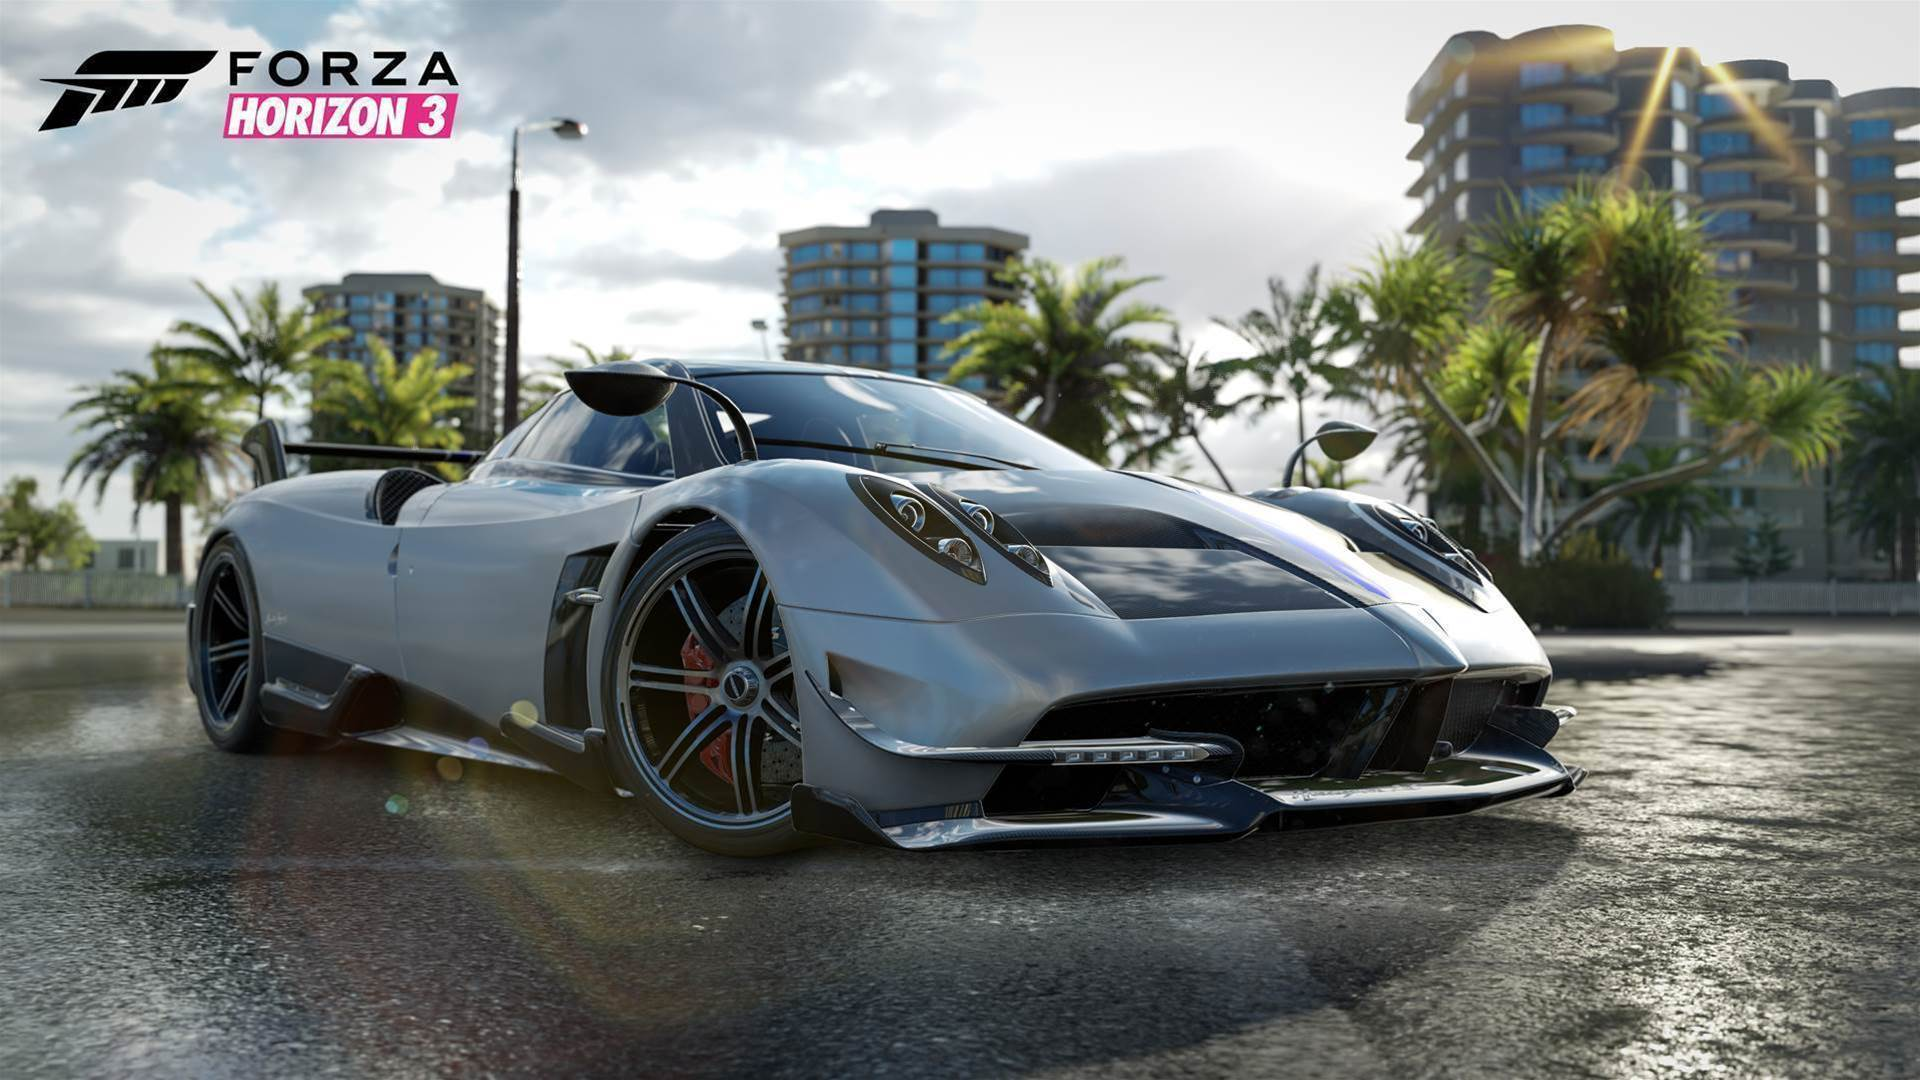 Forza Horizon dev working on open-world action RPG